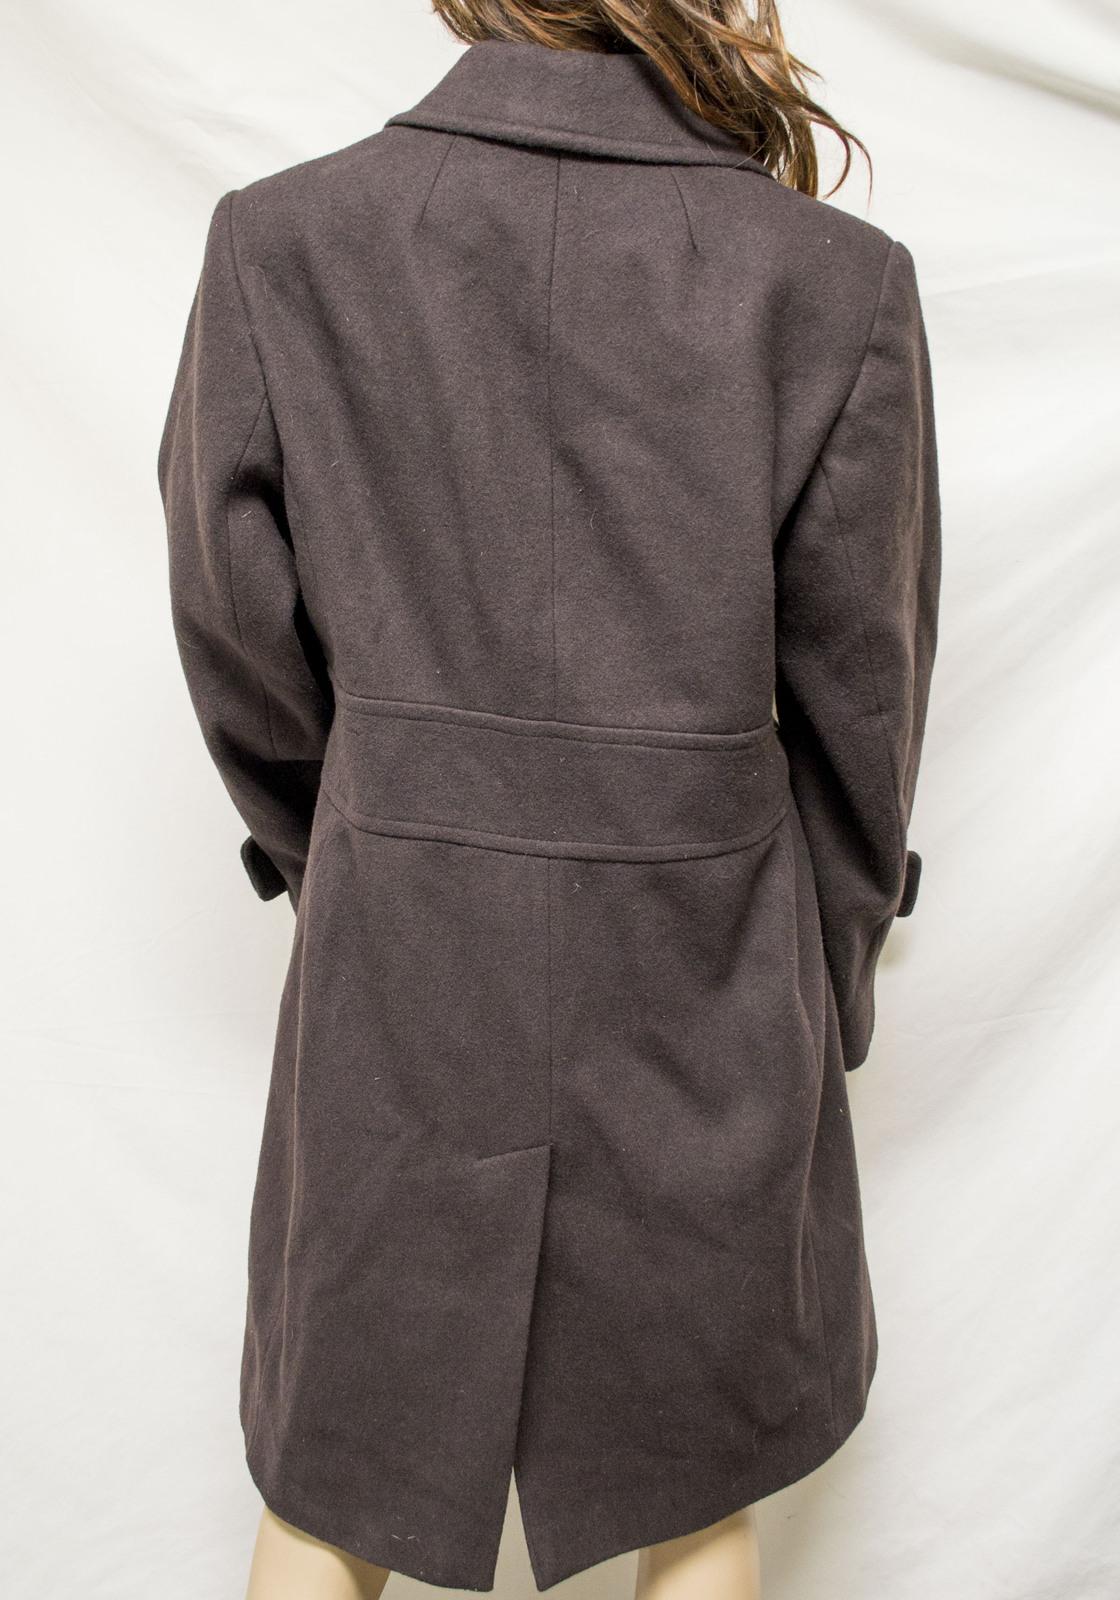 Gaspare Ferrara Size 10 Wool Blend Coat Brown